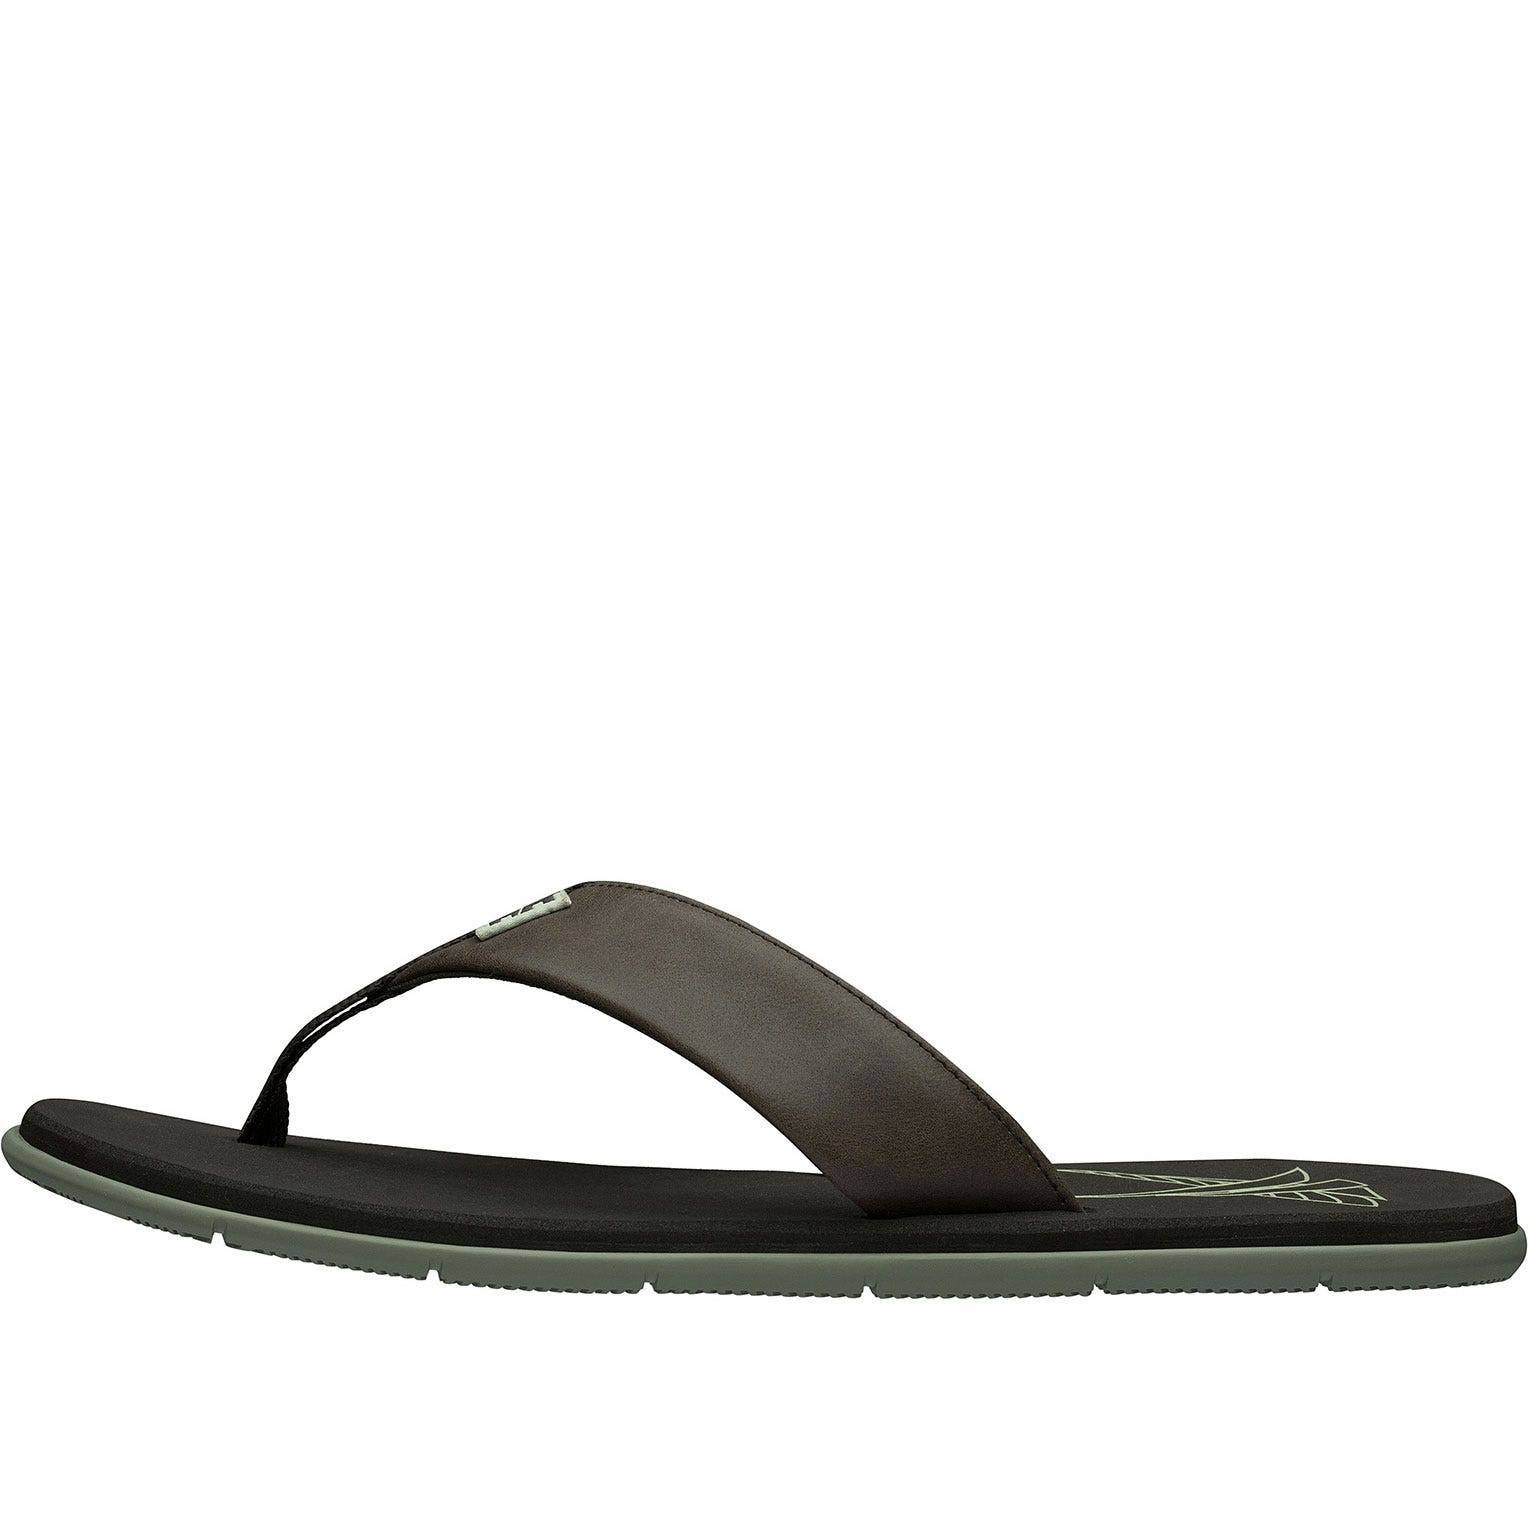 Helly Hansen Herre Seasand Leather Sandal Sko brun 11.5